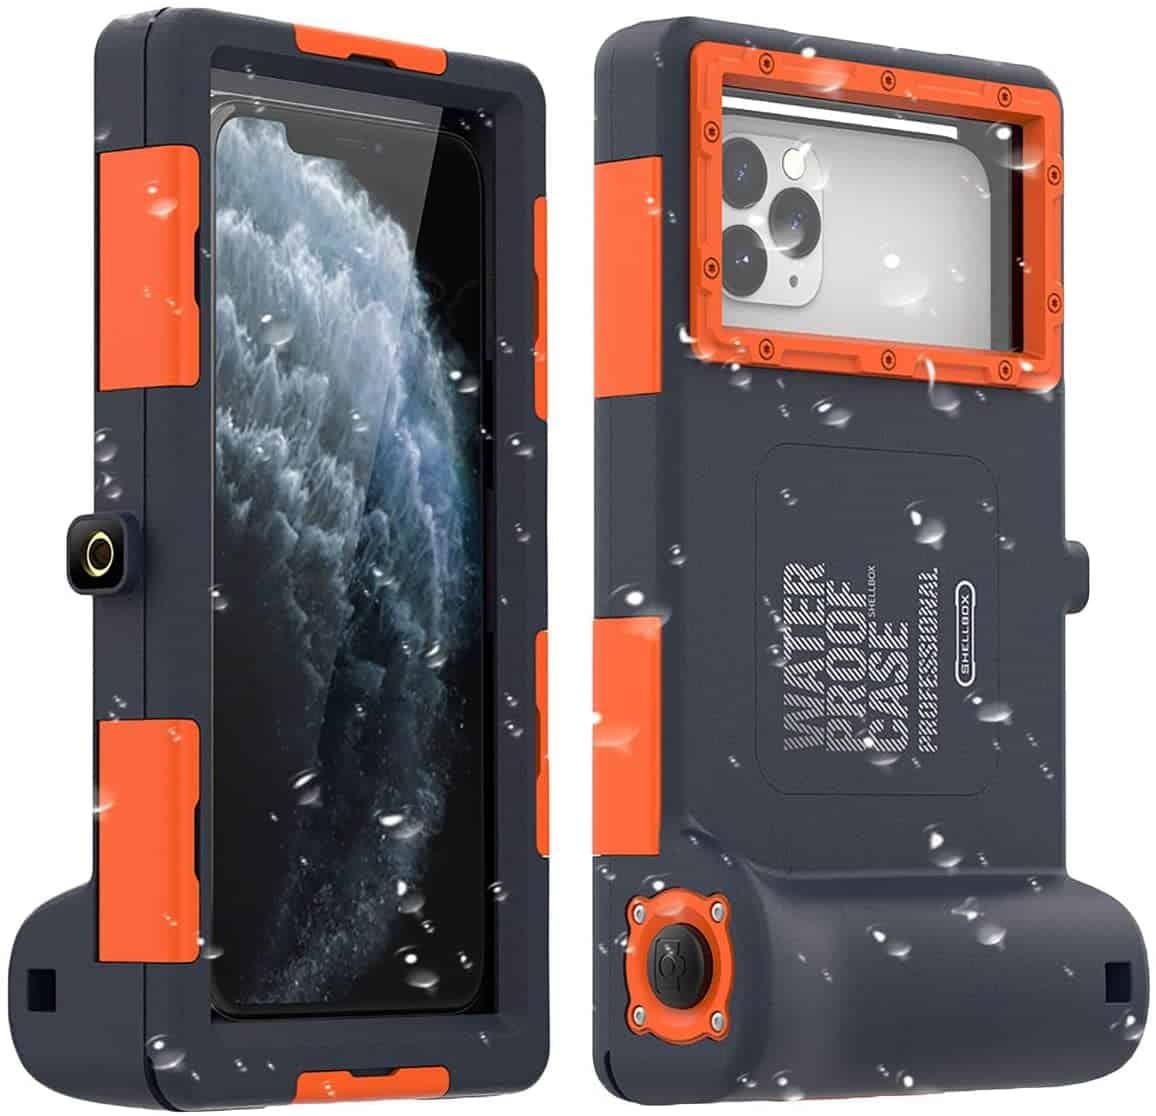 funda resistente al agua para iphone universal